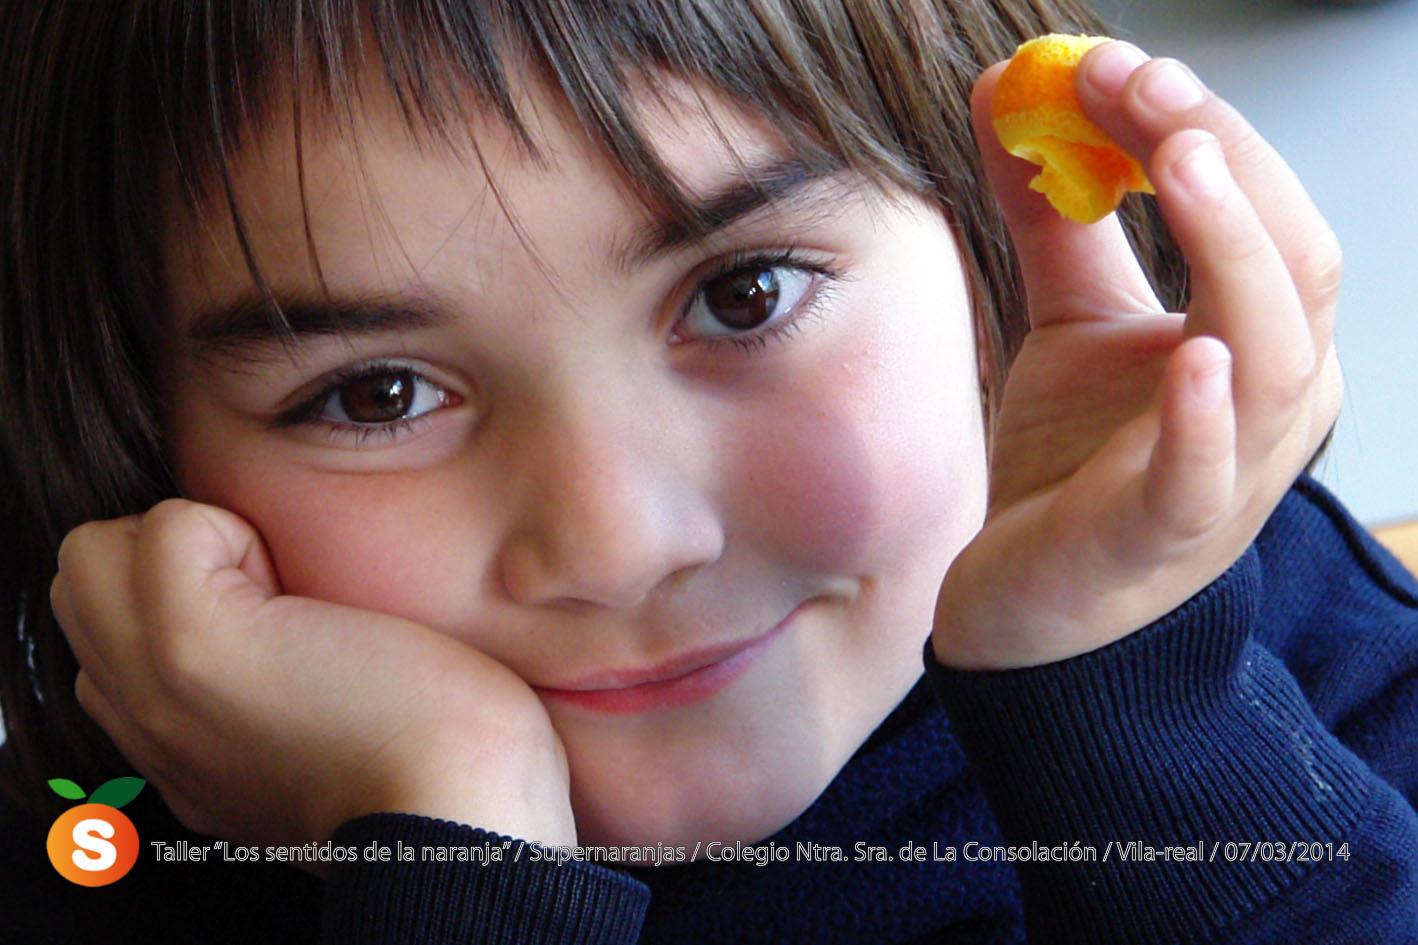 taller-SUPERNARANJAS-consolacion-vila-real-201421